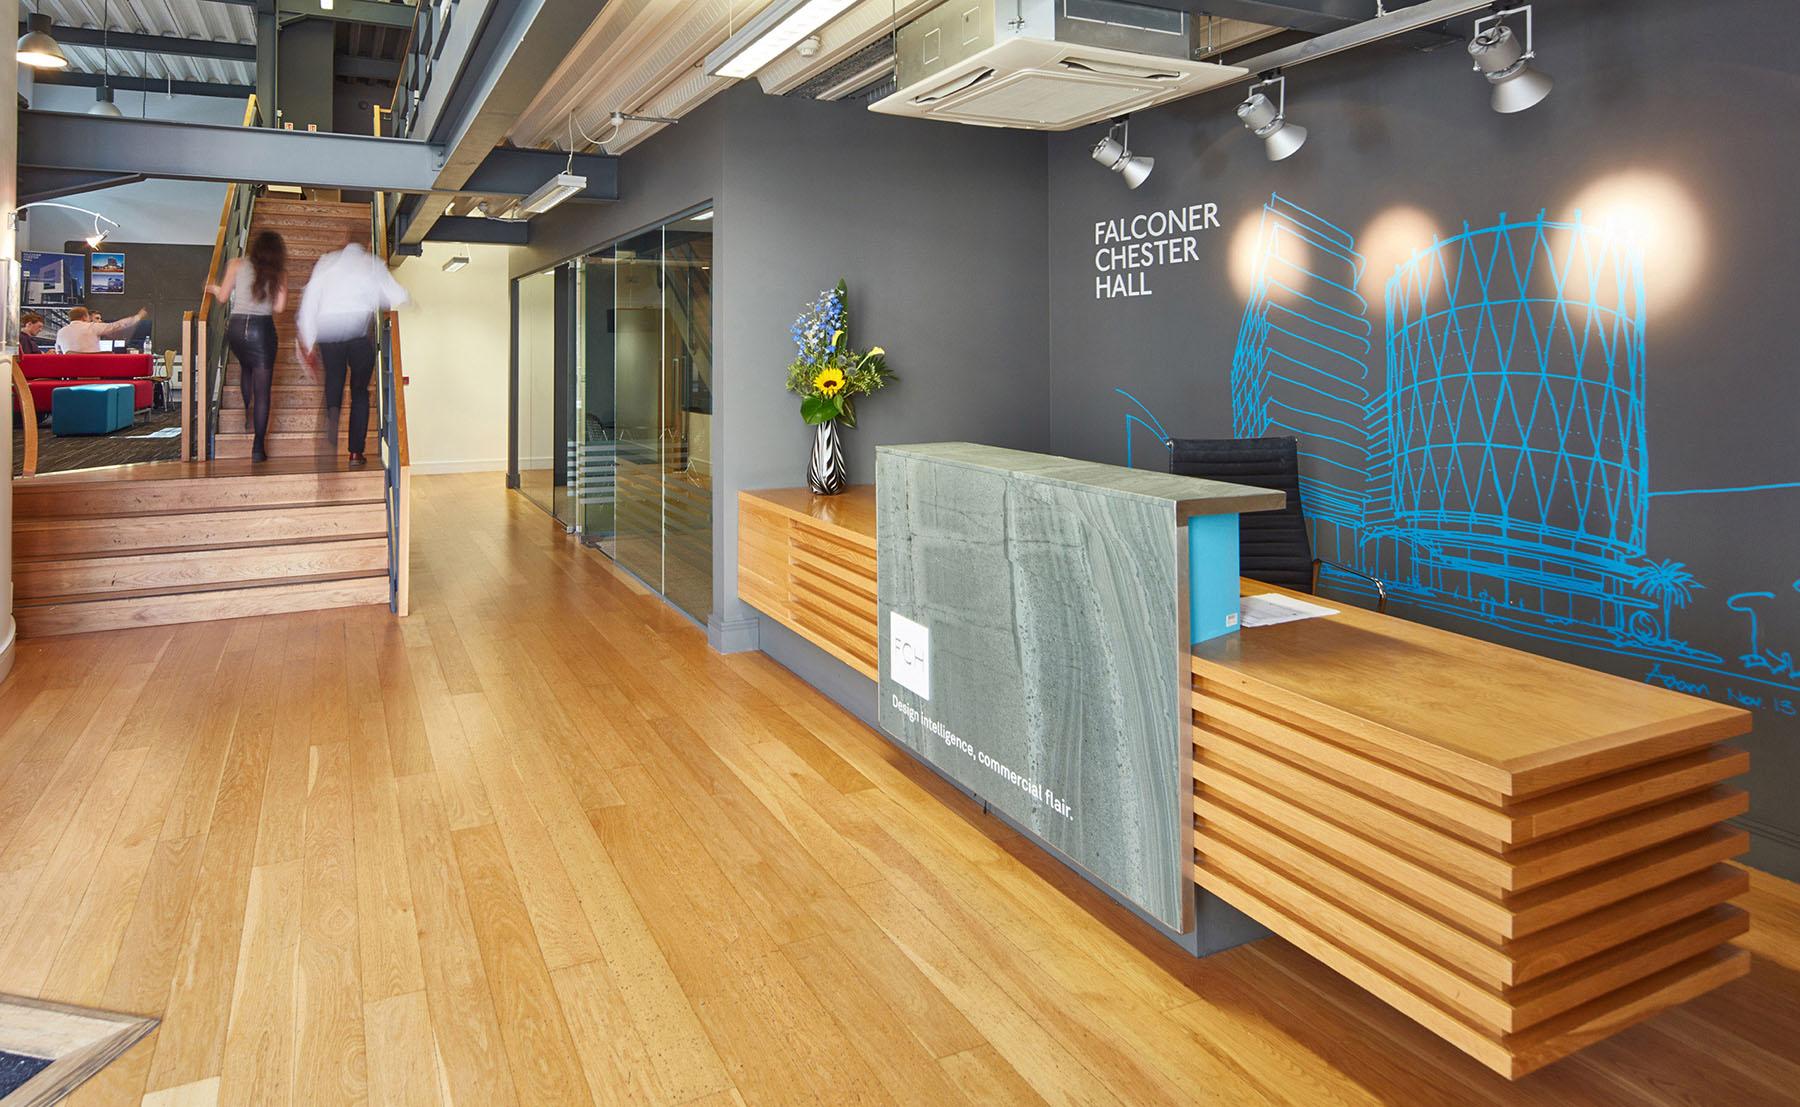 falconer chester hall reception design by Leeds based Freelance Designer Neil Holroyd